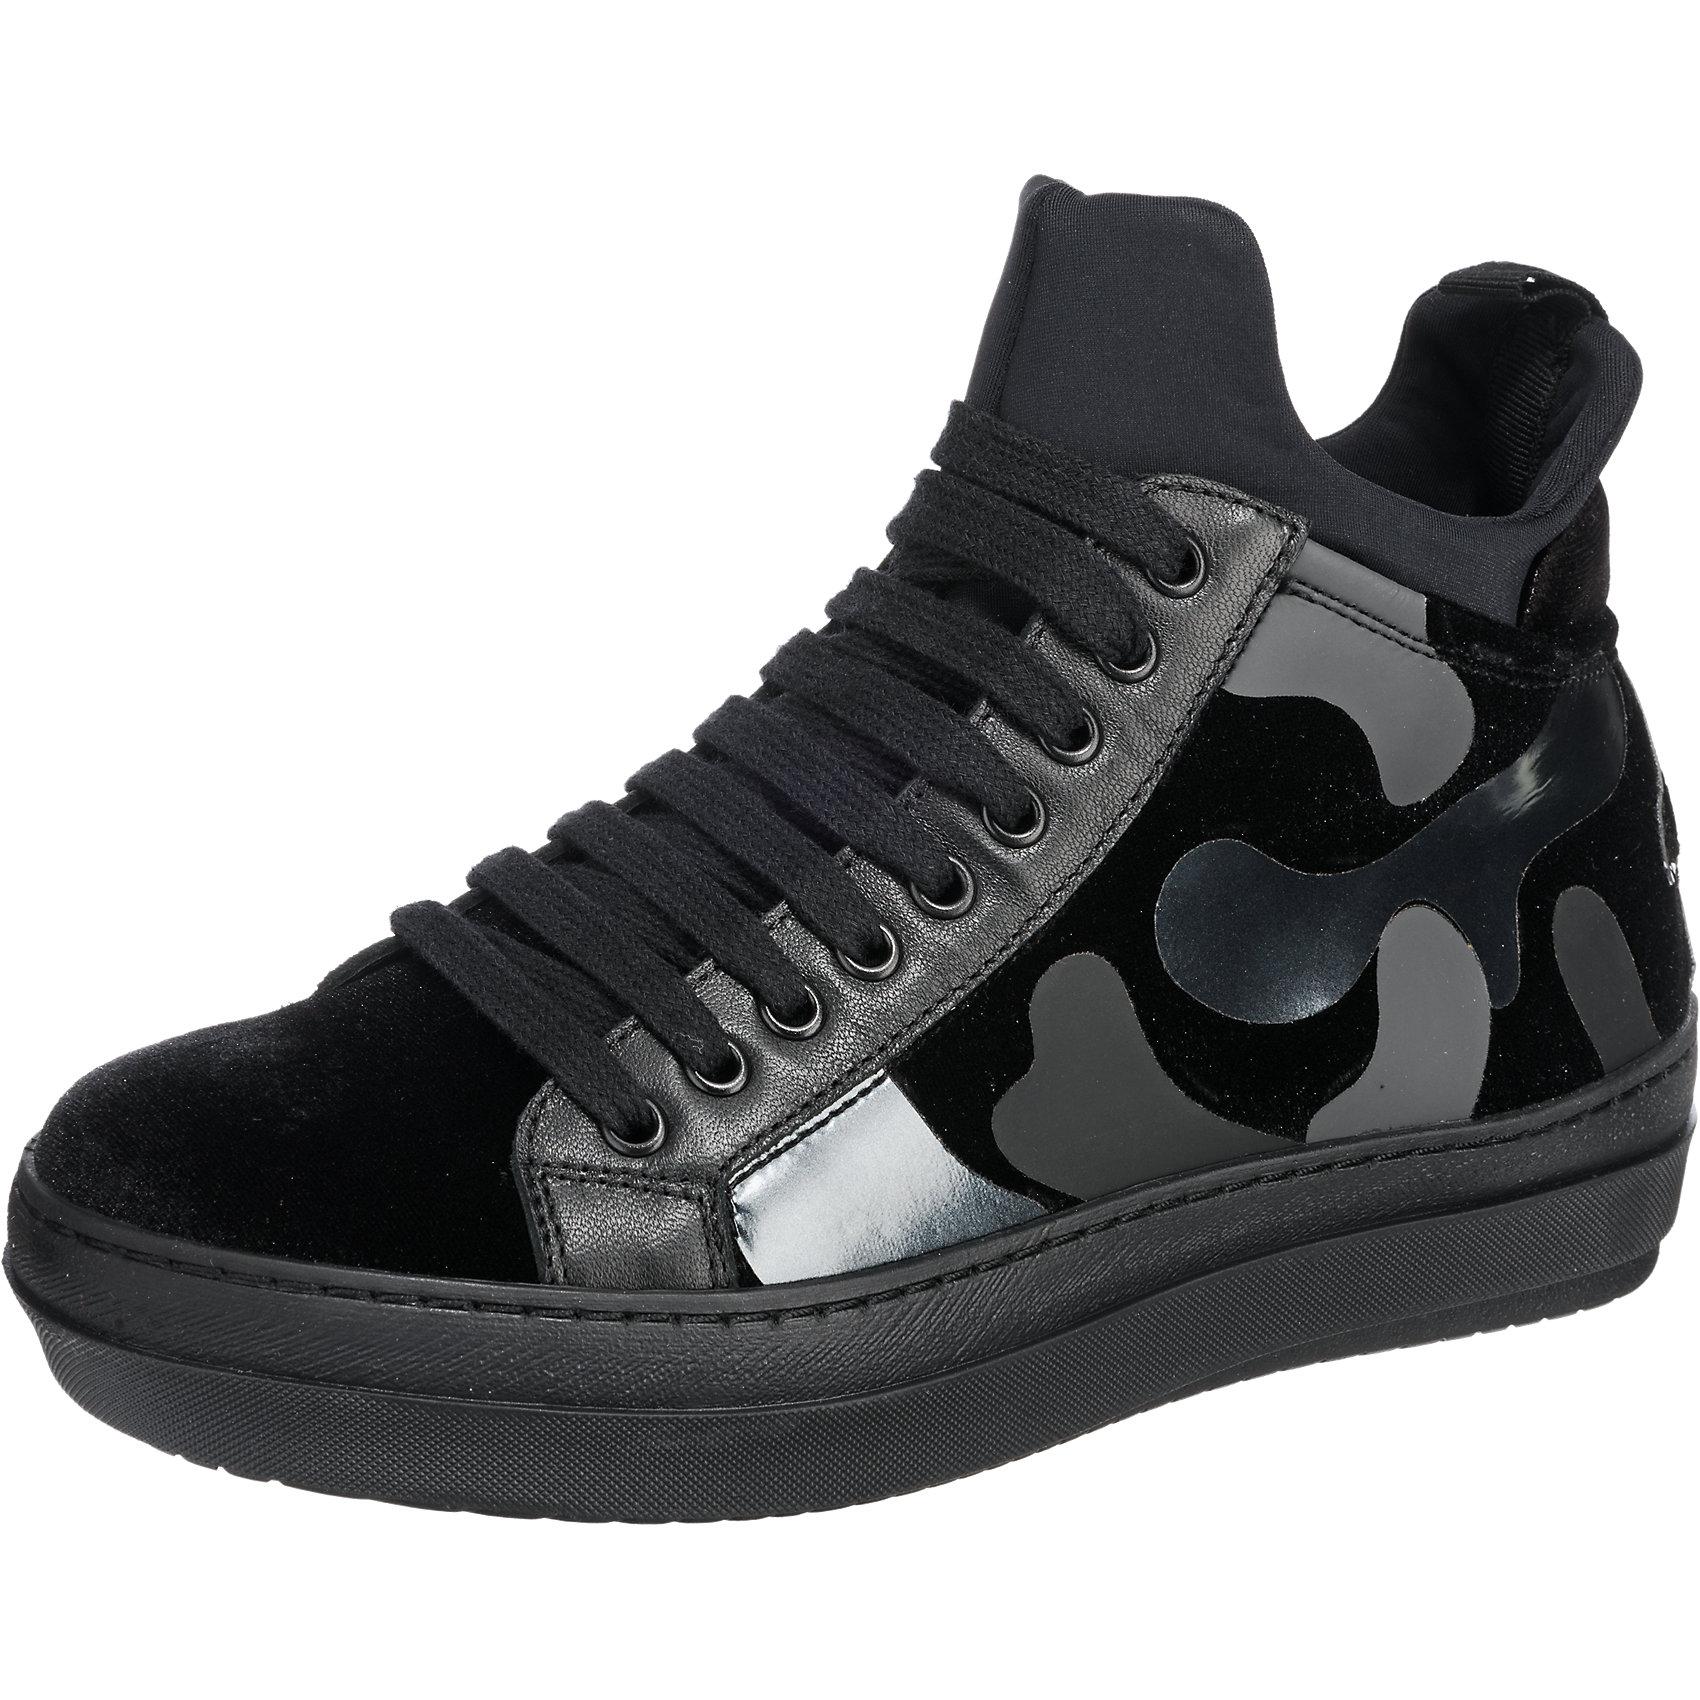 634acc68b25f ... Nike Air Zoom Grade Black White Quick-Lacing Mens Mens Mens Shoes  Sneakers 924465- ...